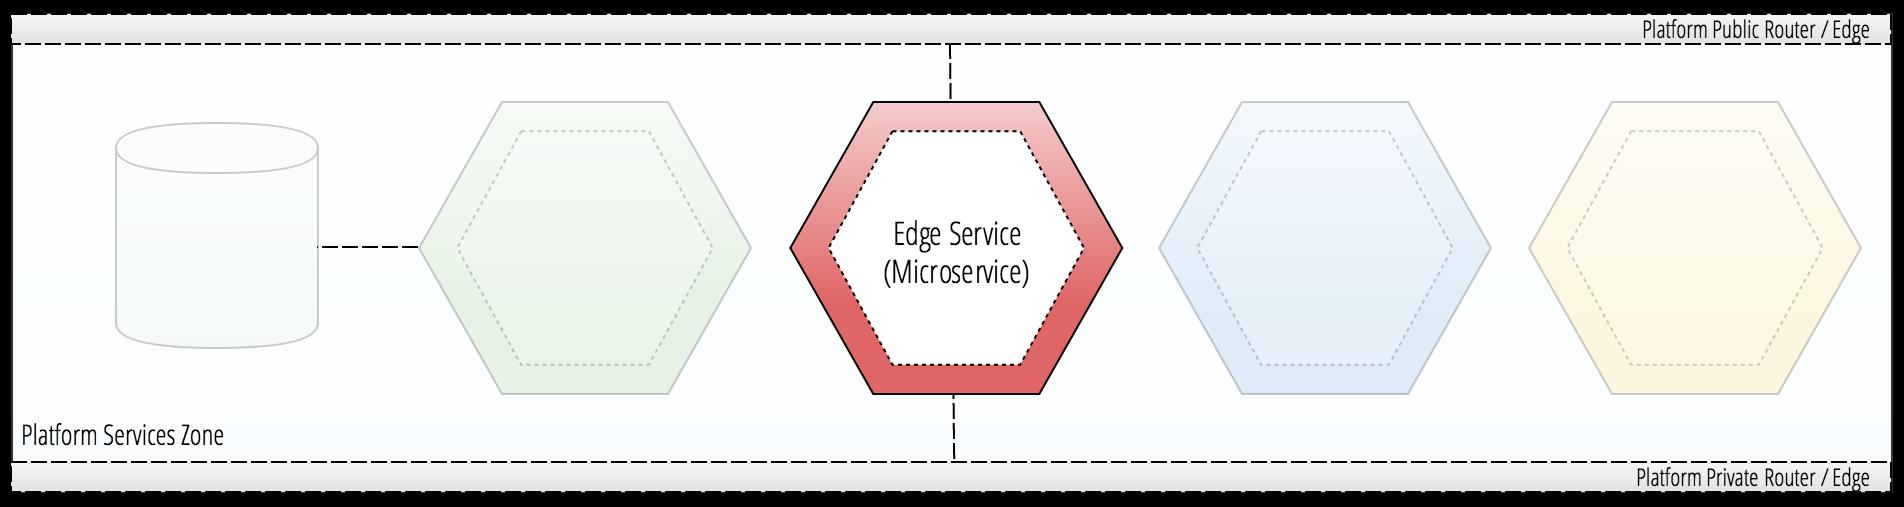 Edge service